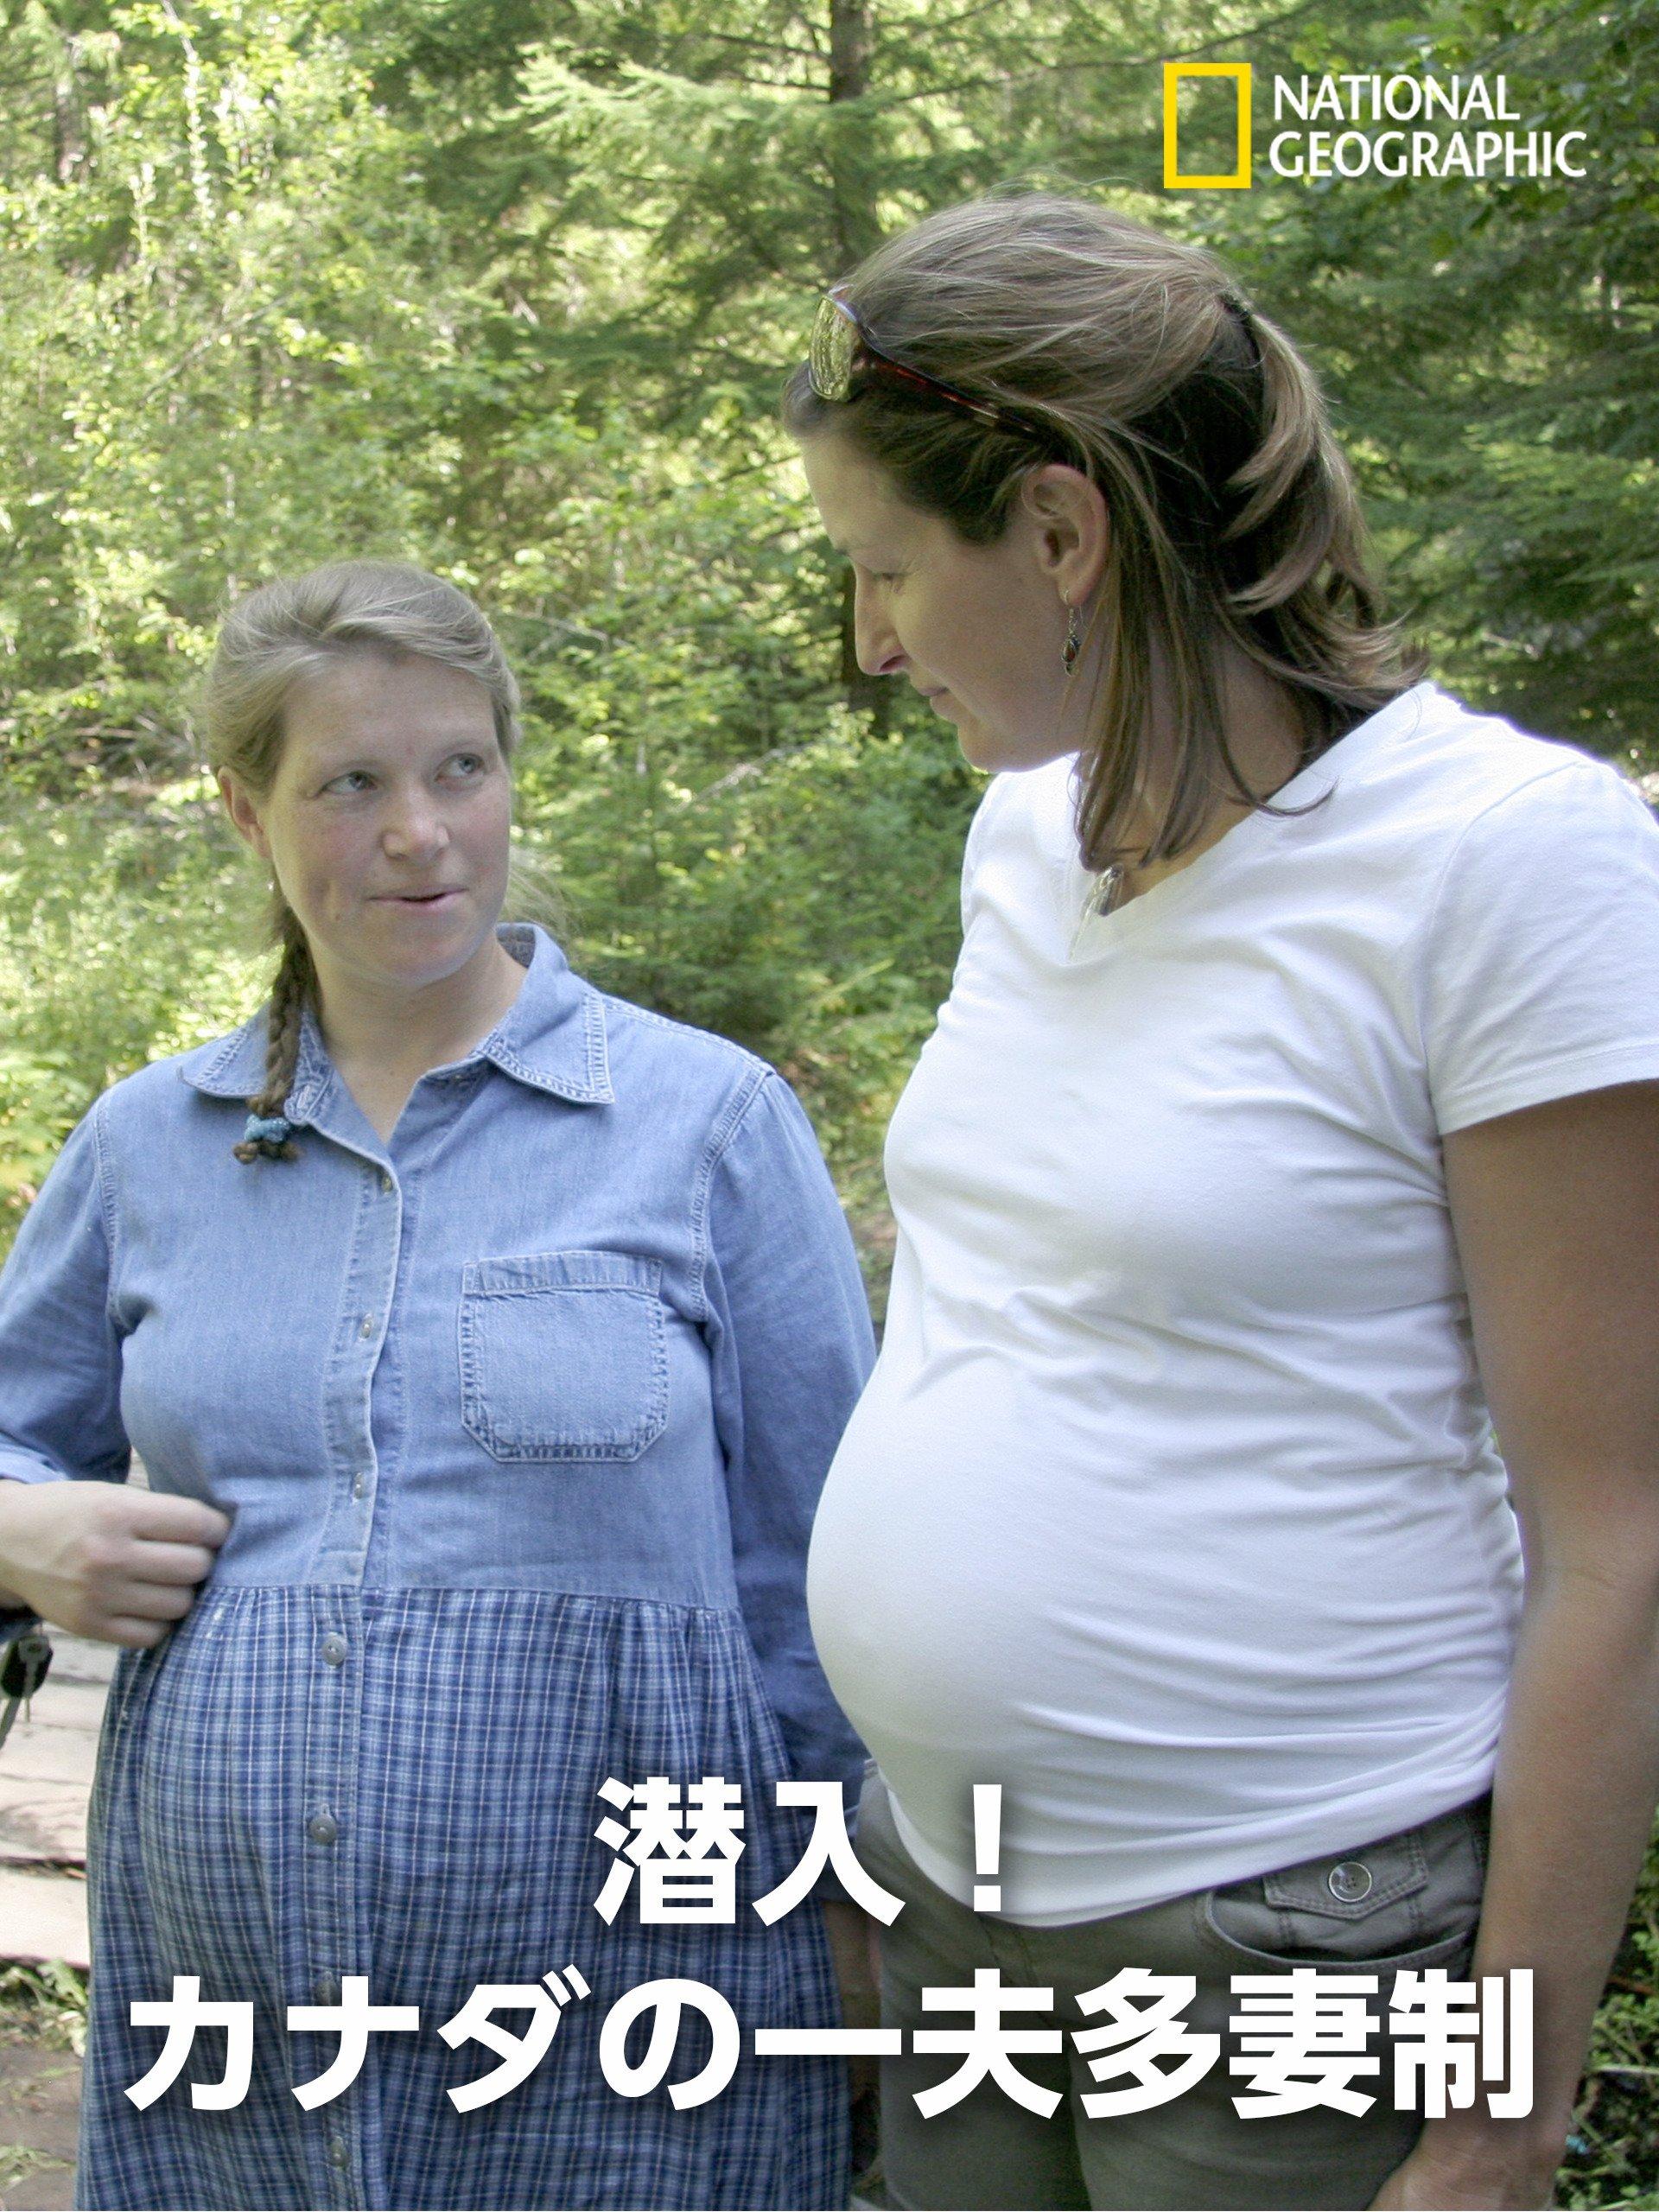 Amazon.co.jp: 潜入!カナダの一夫多妻制を観る | Prime Video